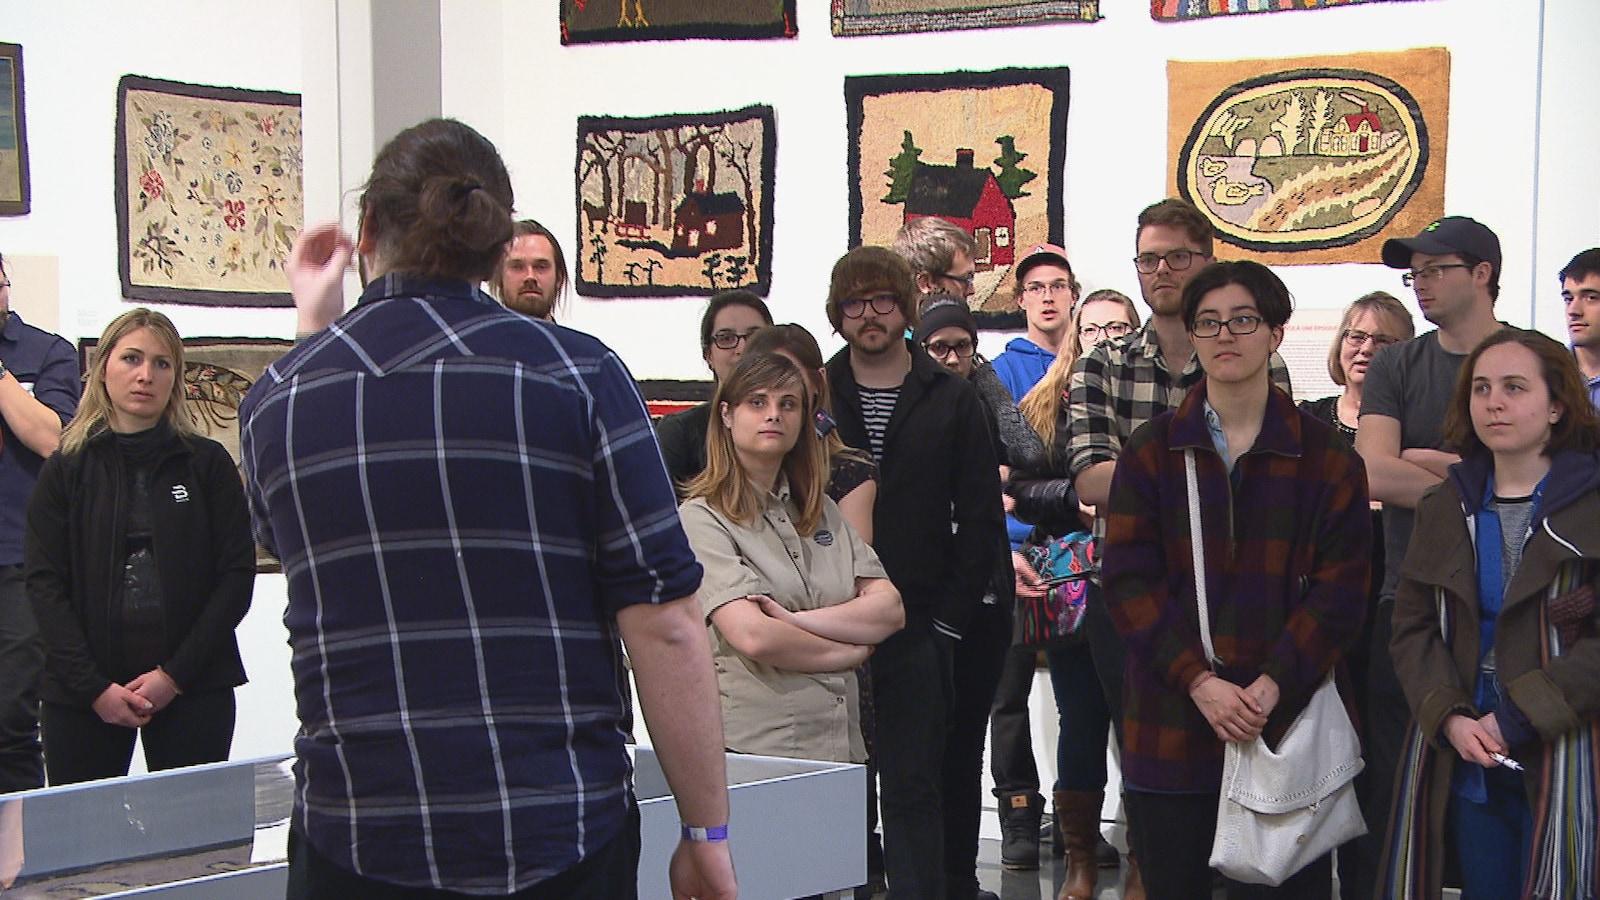 Un jeune public absorbé au musée